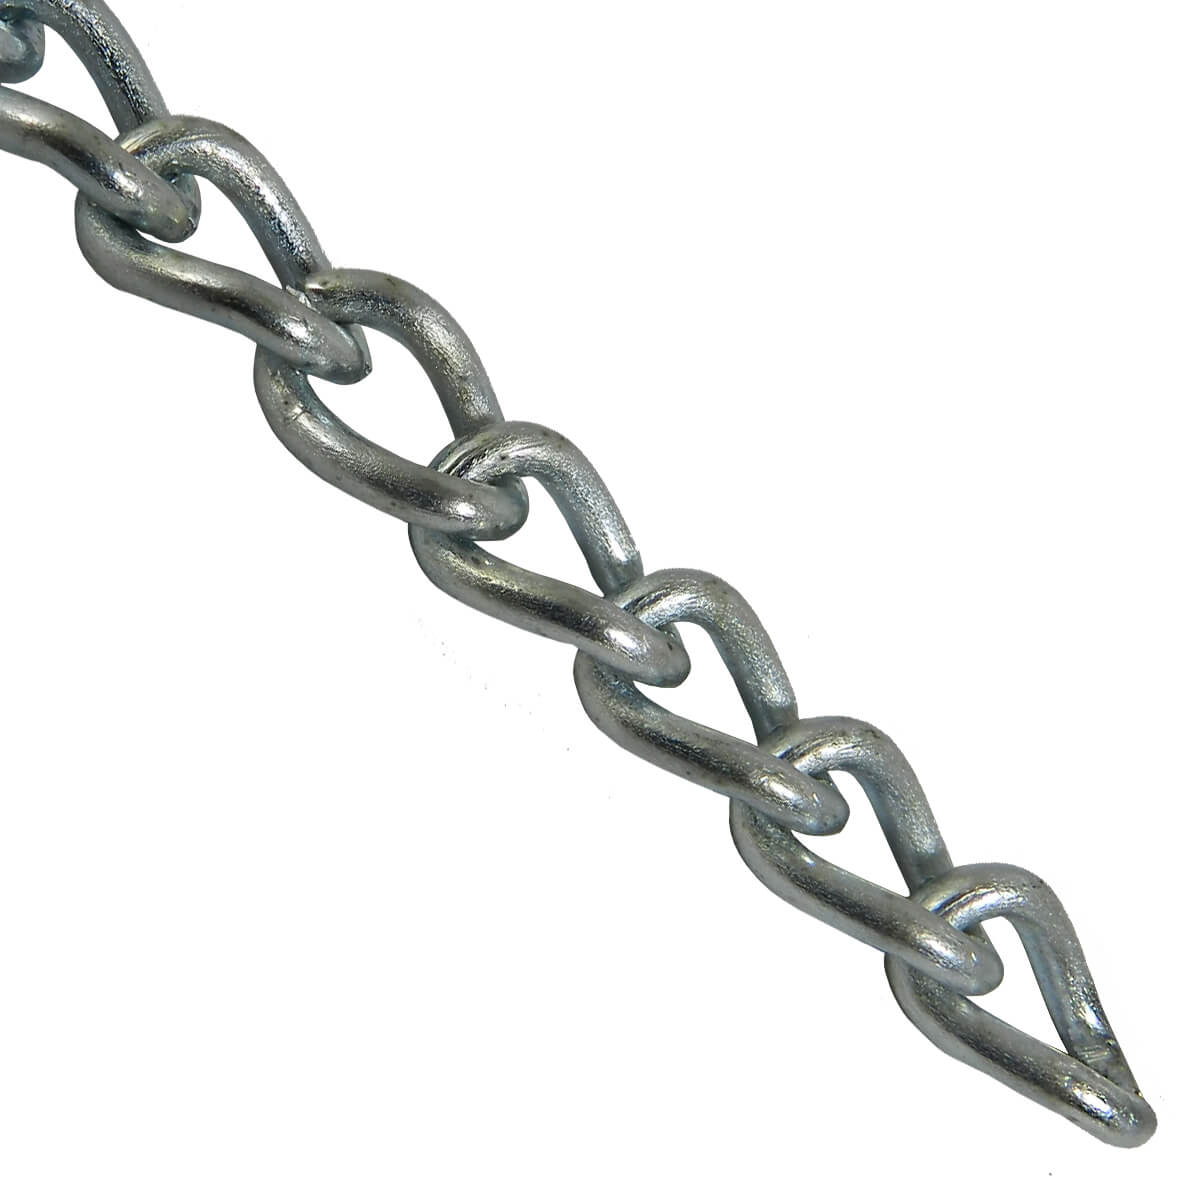 Machine Twist Chain - #4 - Price / ft